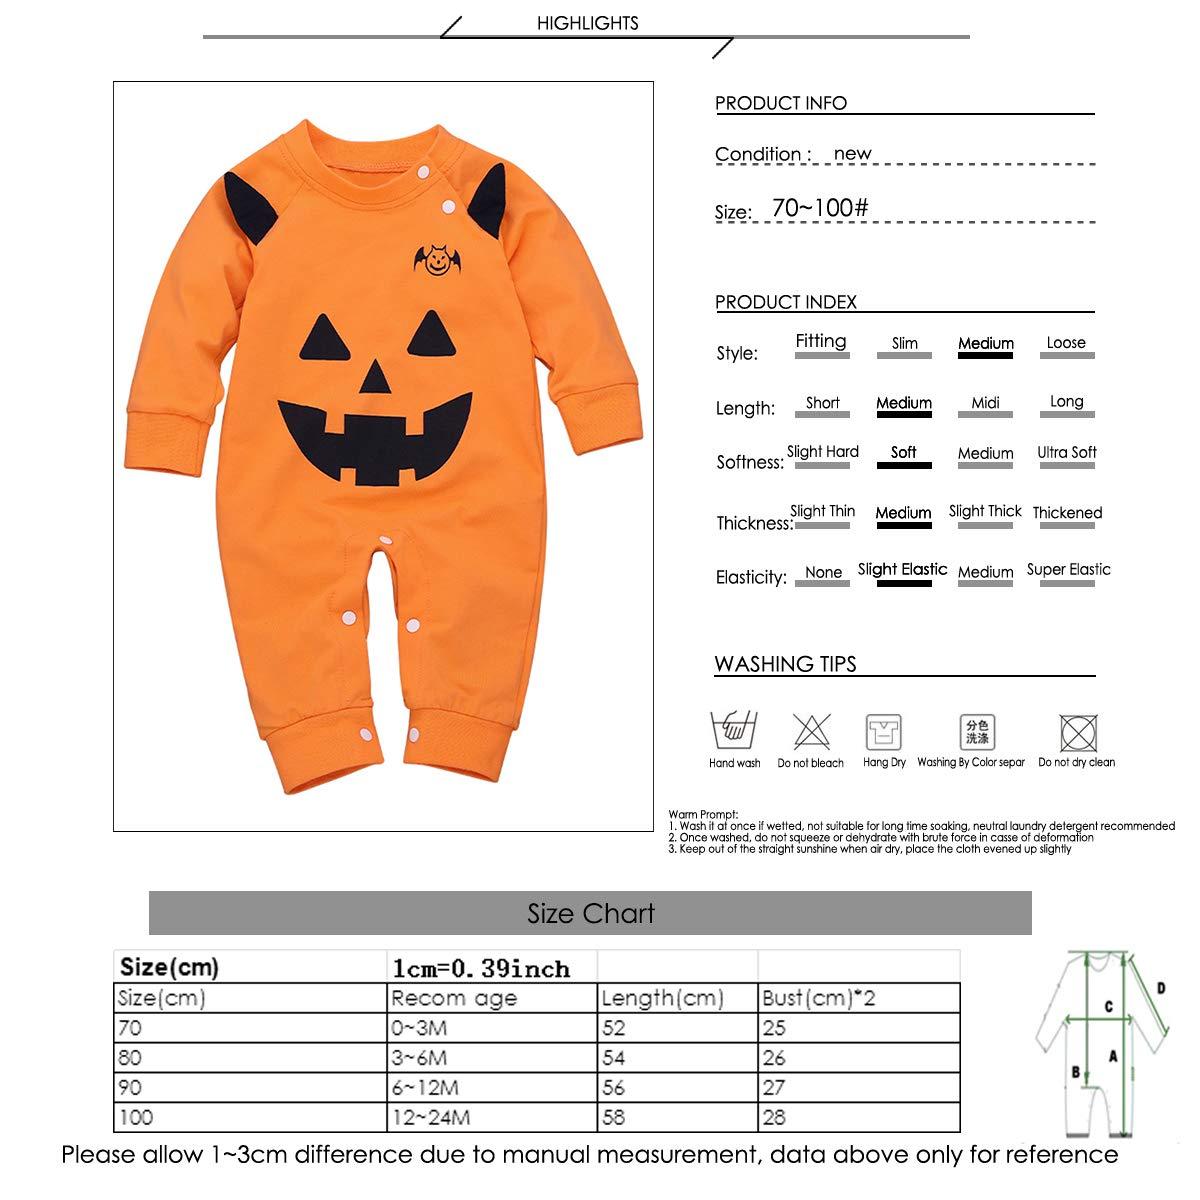 Borlai Baby Girls Boys Outfits Halloween Costume Newborn Pumpkin Romper Bodysuit Playsuit Cute Jumpsuit 0-24M